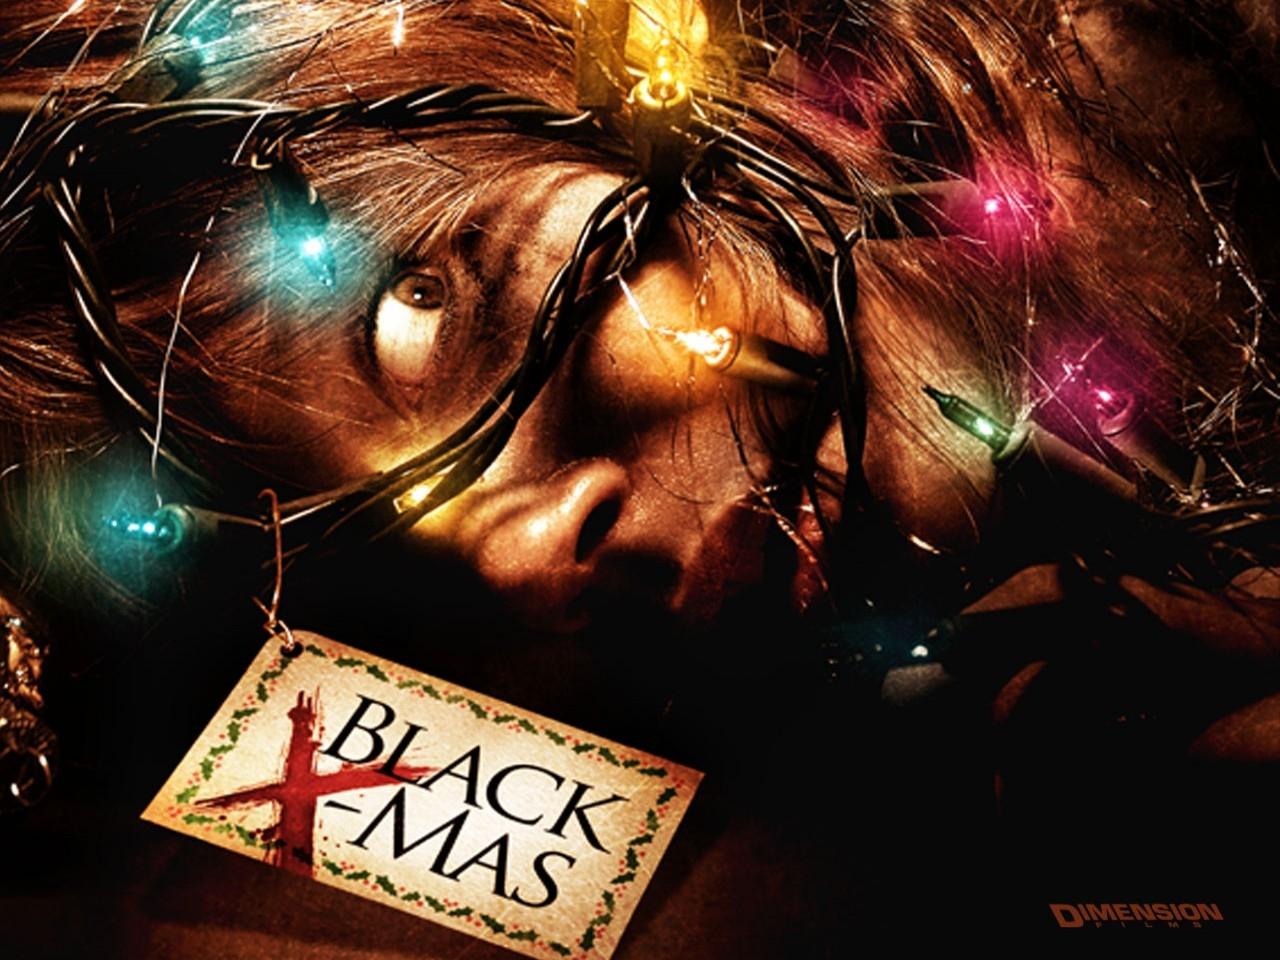 Wallpaper del film Black Christmas - Un Natale rosso sangue (2006)